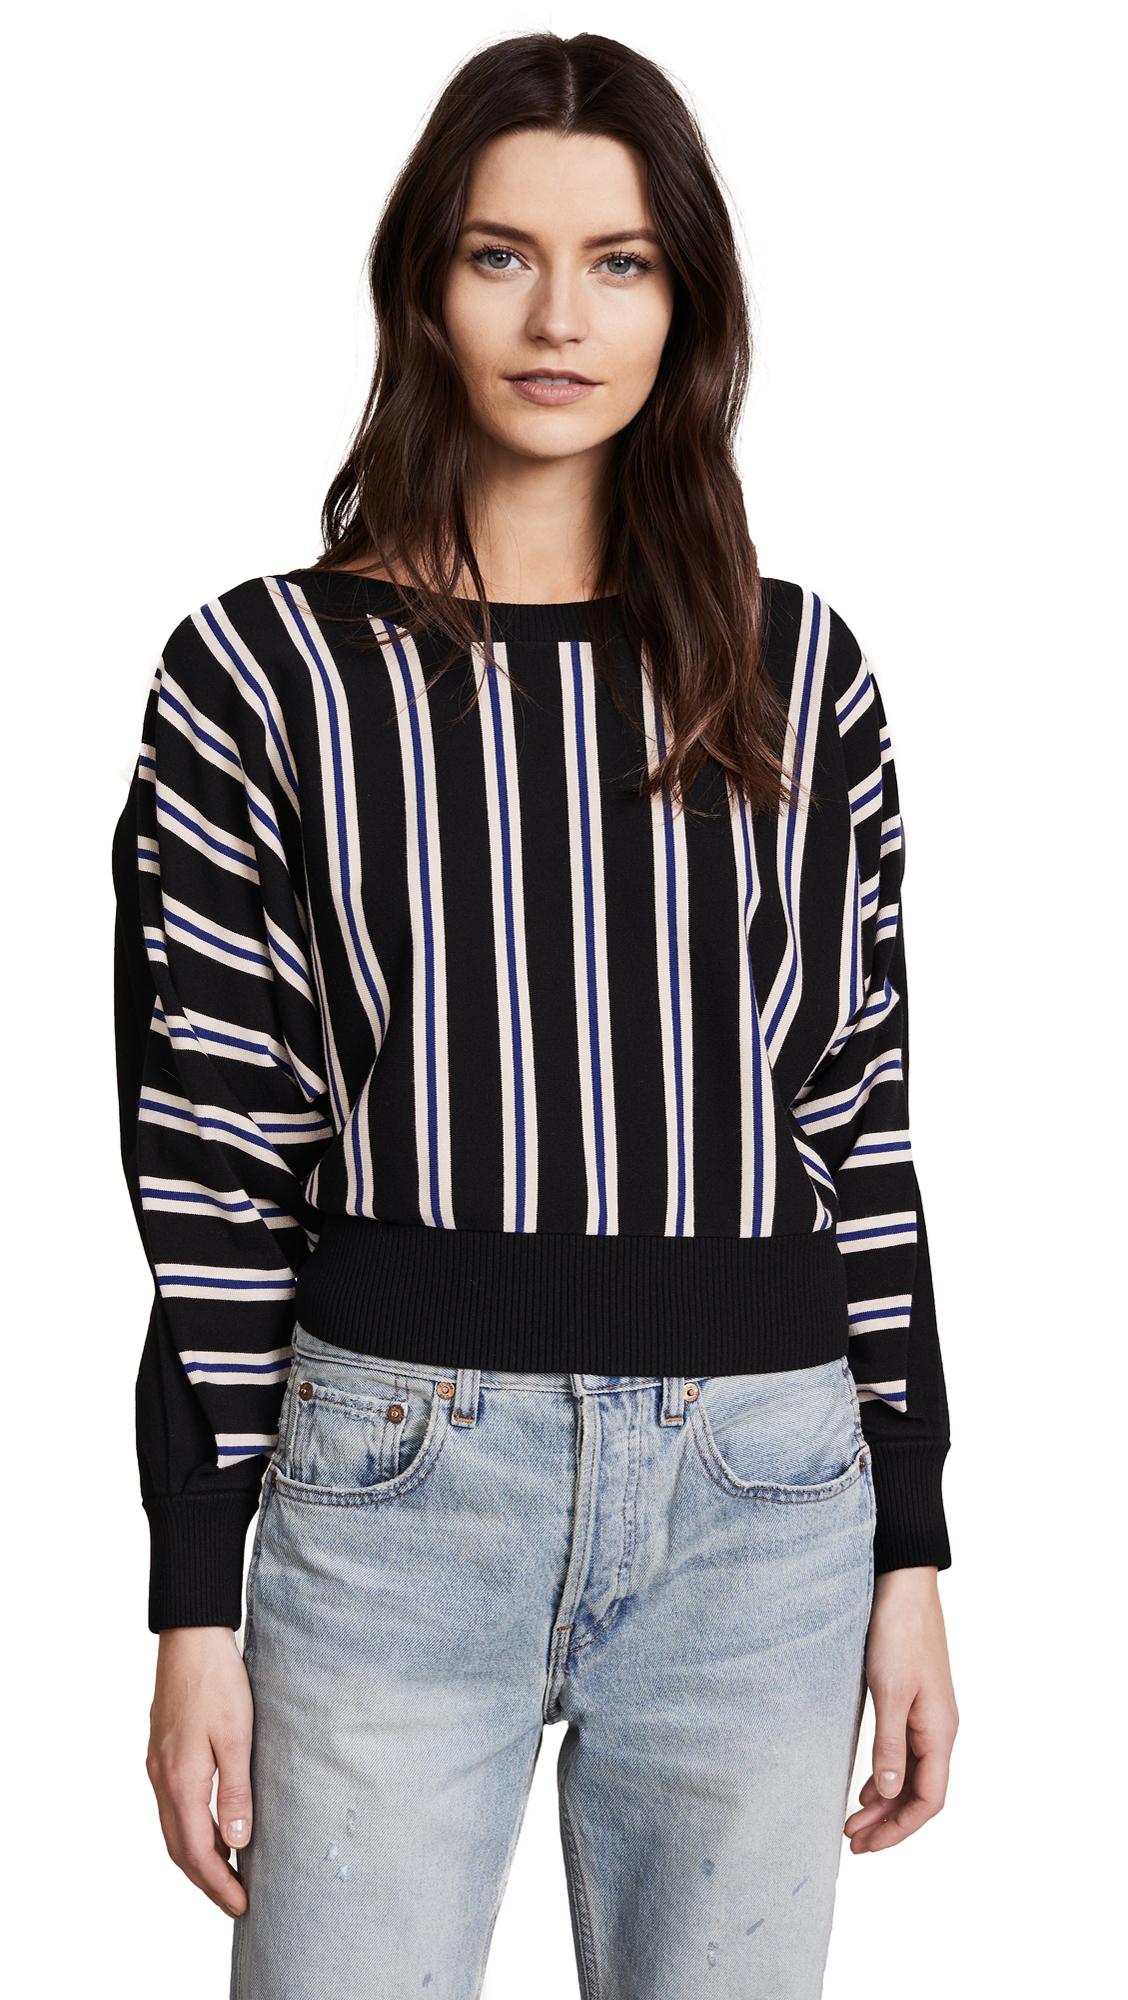 3.1 Phillip Lim 3/4 Sleeve Ottoman Stripe Sweater - Black